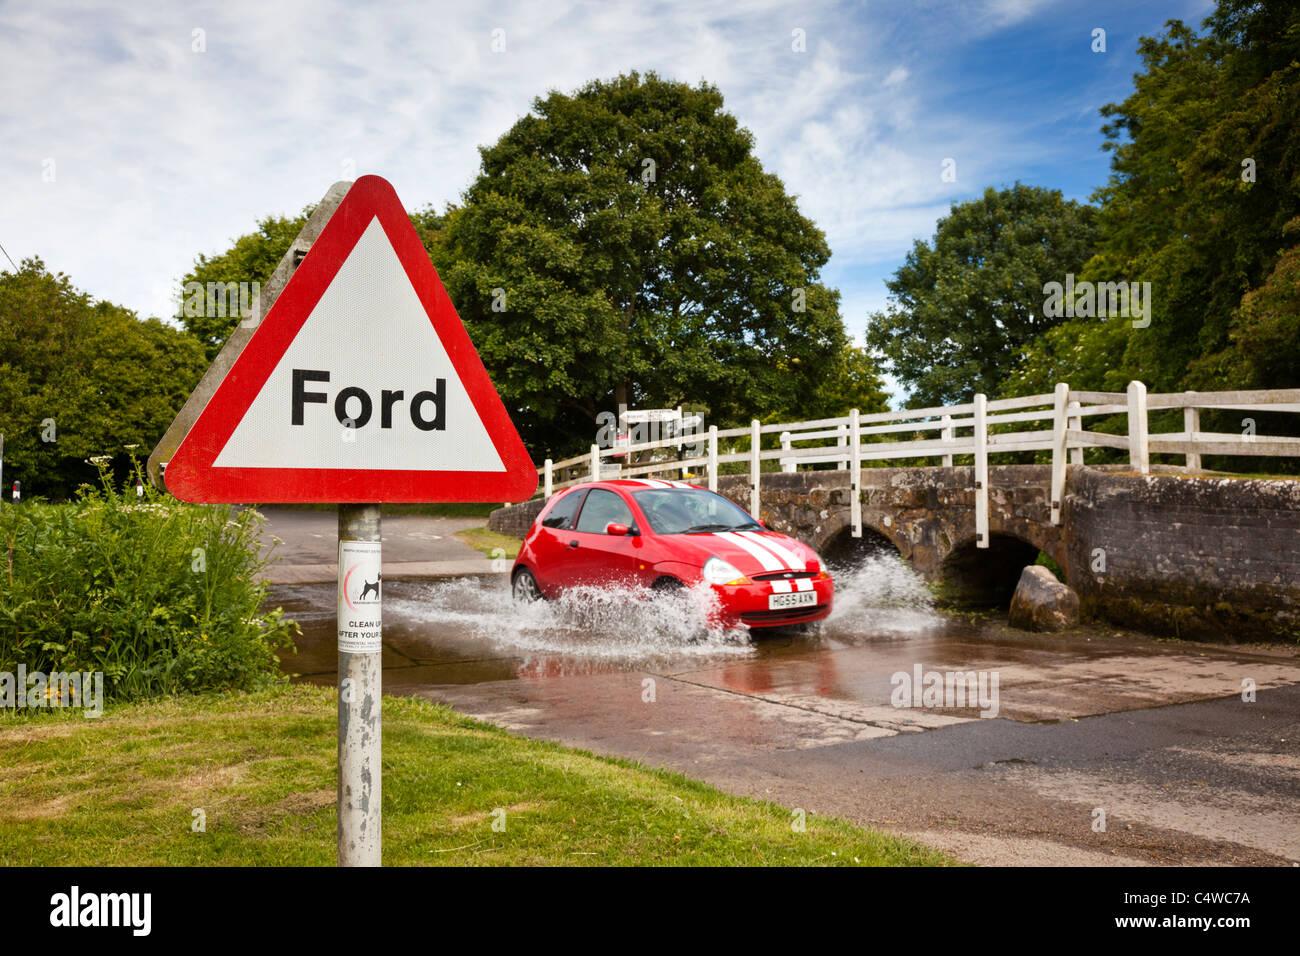 Vehicle car fording a river at Tarrant Monkton, Dorset, England, UK - Stock Image